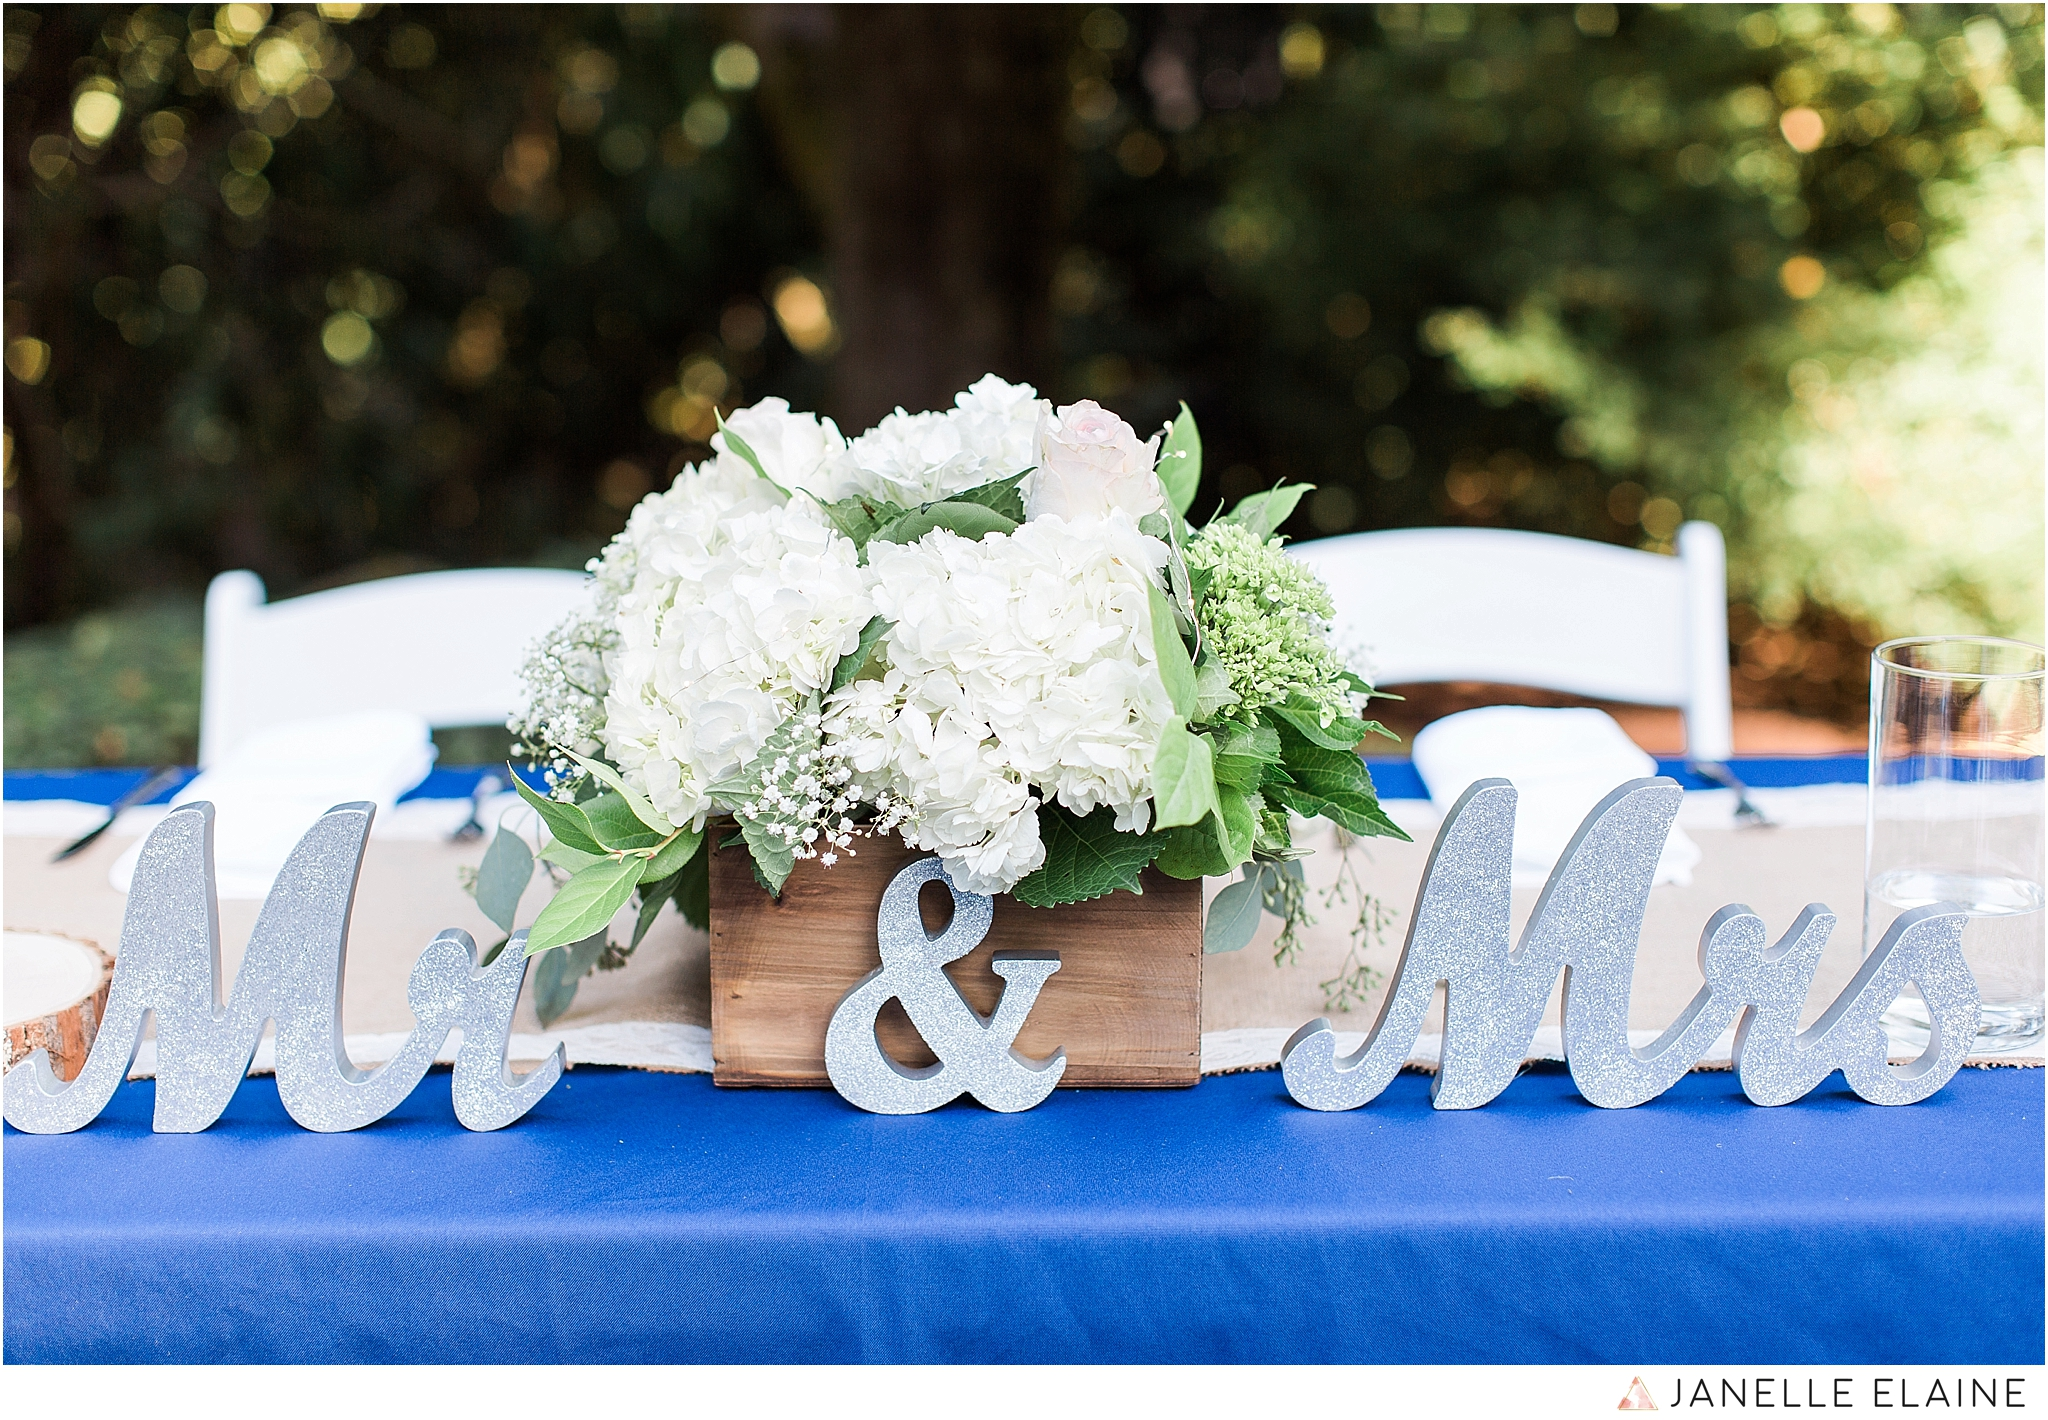 janelle elaine photography-professional wedding photographer-seattle-bellevue-robinswood house-107.jpg